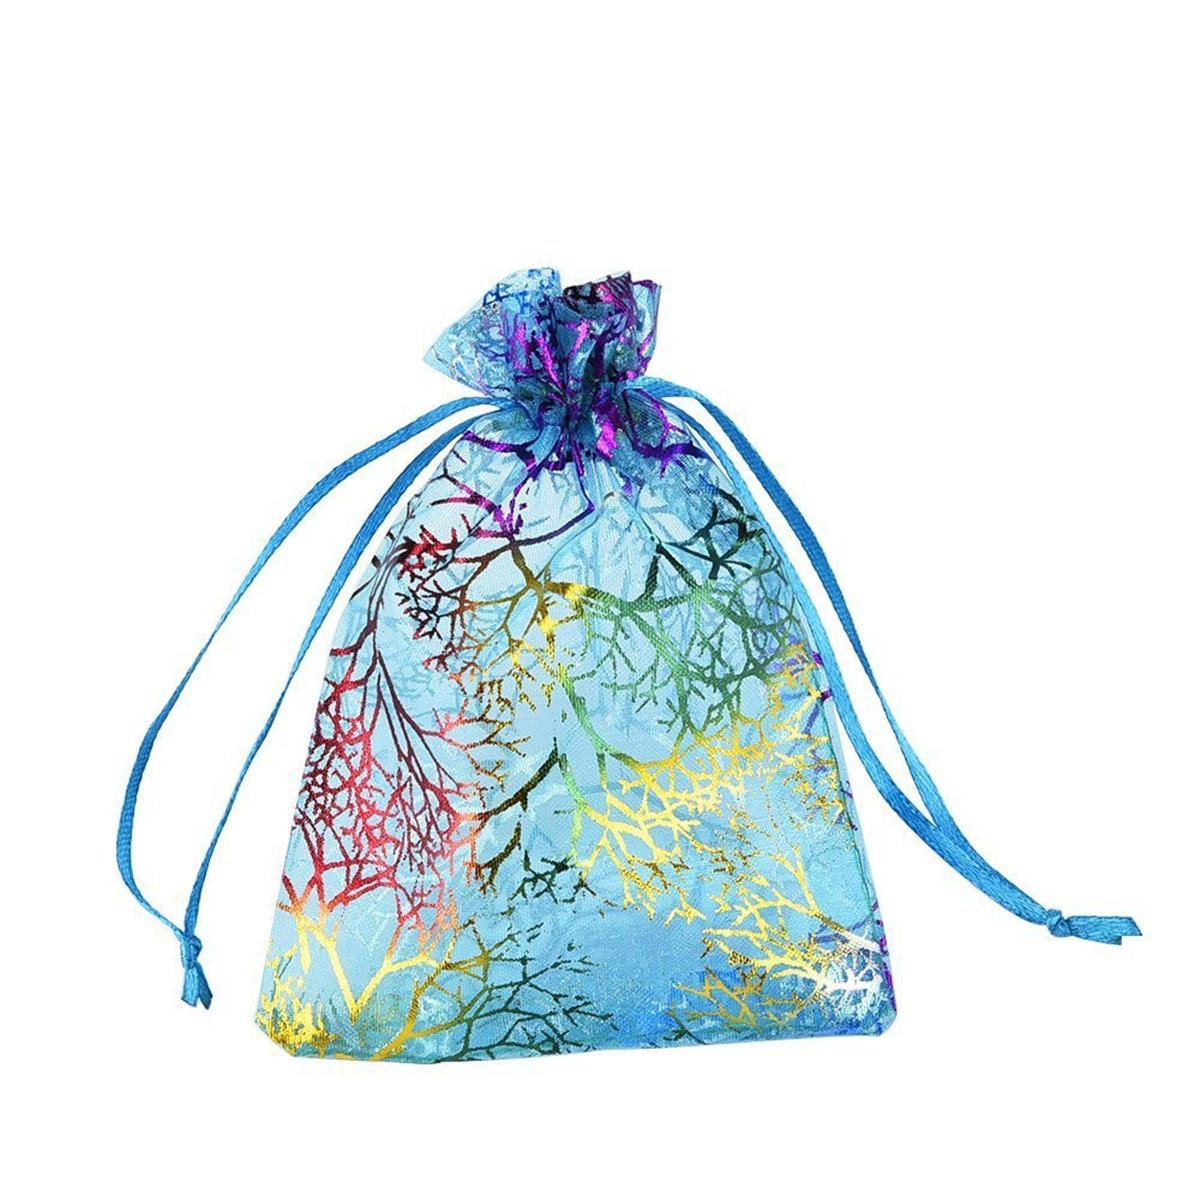 8bcc86fc9 50 piezas de regalo de organza coralina Bolsa bolsa de joyas de caramelo  Boda fiesta favor